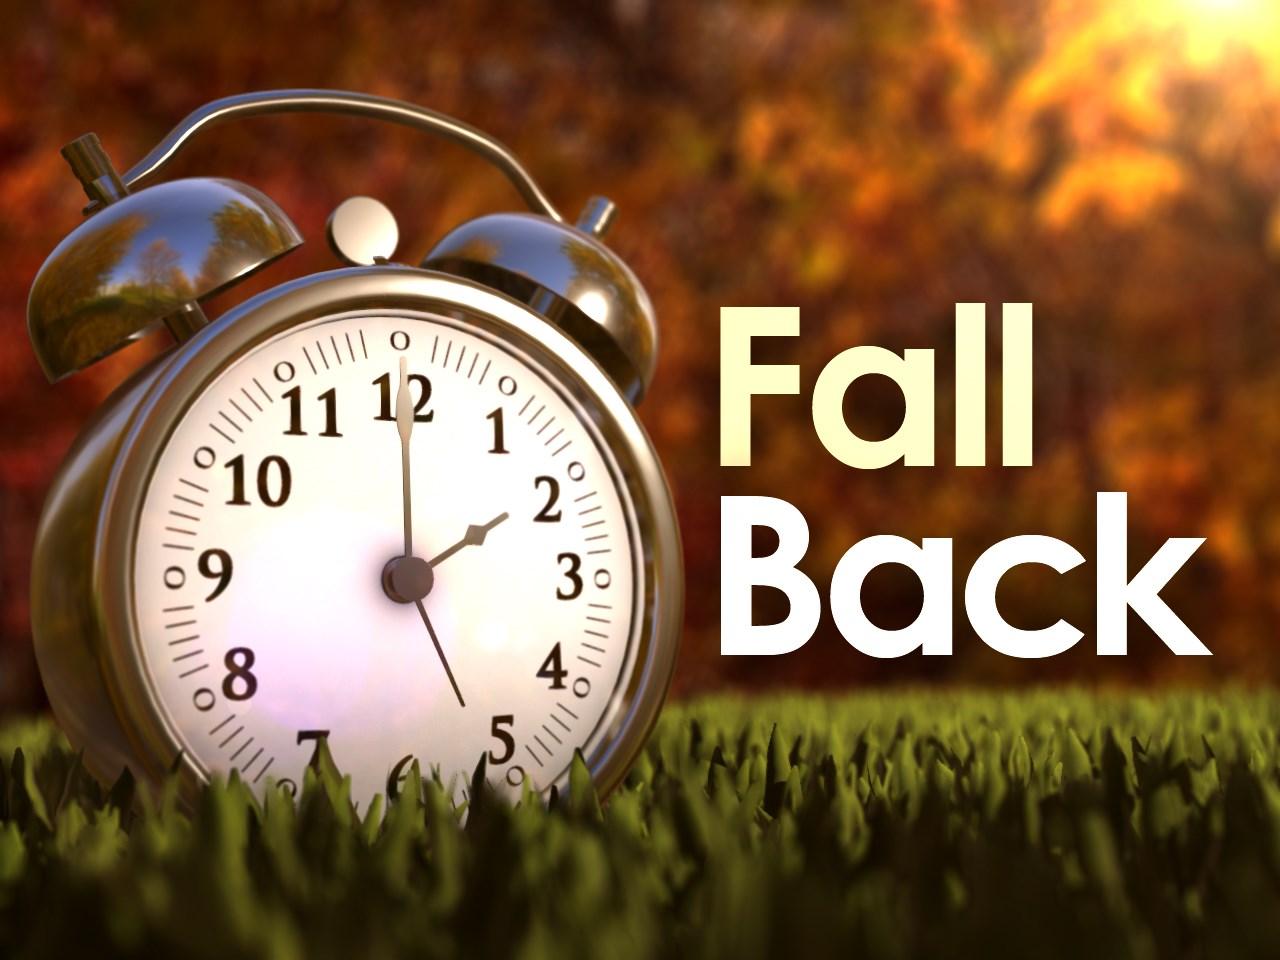 Fall Back_Daylight Savings Ends 2018.jpg